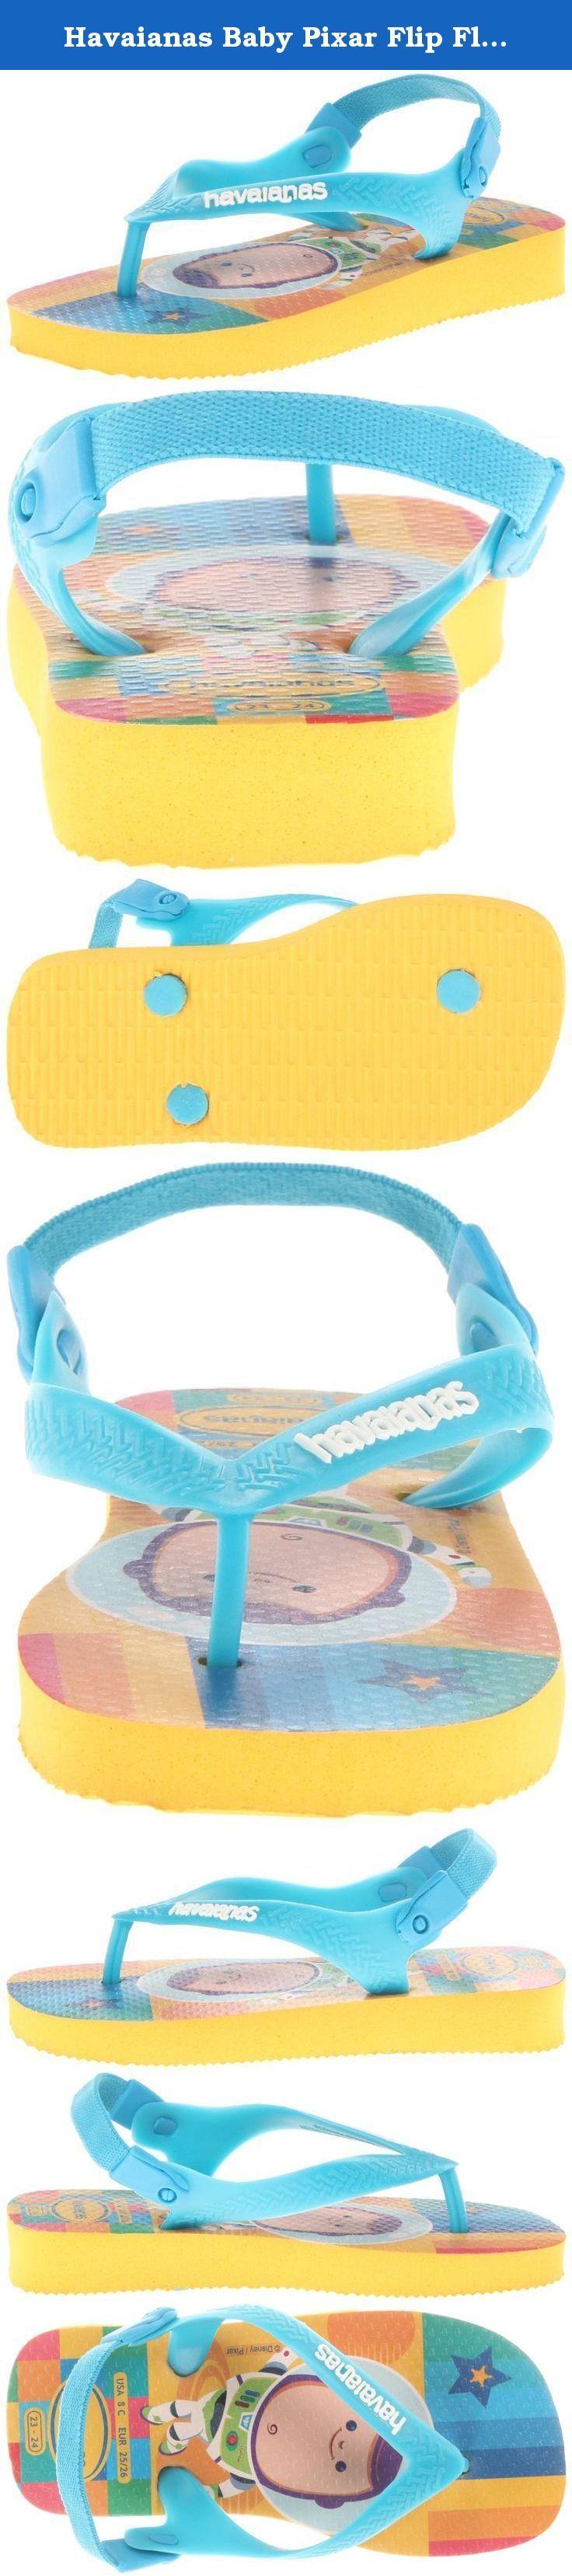 Havaianas Baby Pixar Flip Flop (Toddler),Banana Yellow,19 BR (5 M US Toddler). Havaianas - Baby Pixar Sandal- Banana Ylw-19.